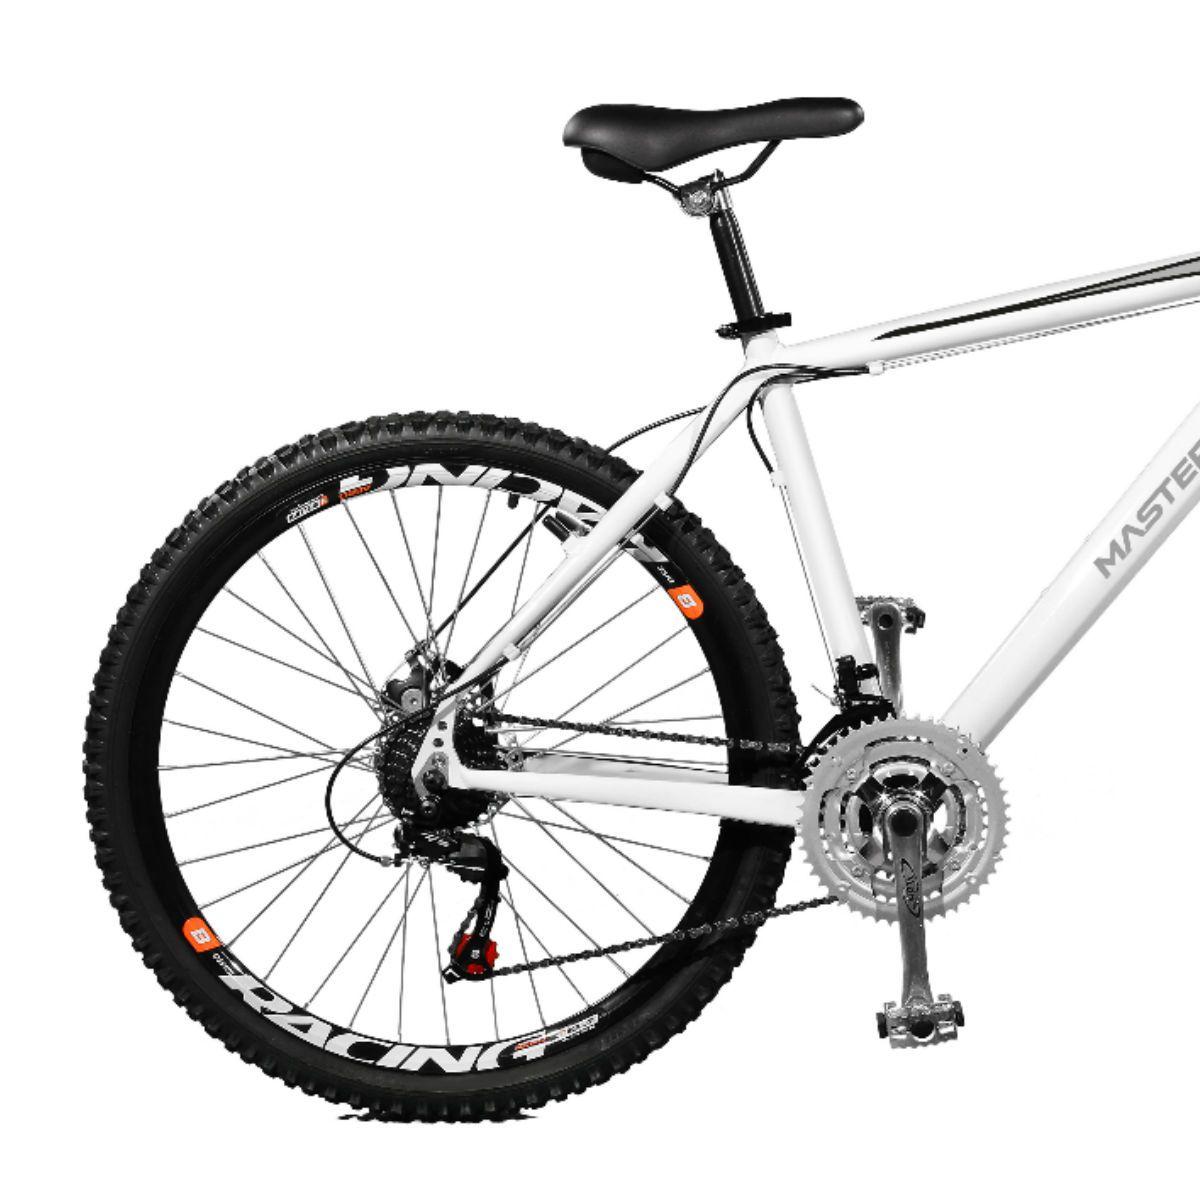 Bicicleta Master Bike Aro 26 Volcano Freio à Disco A-36 21 Marchas Branco